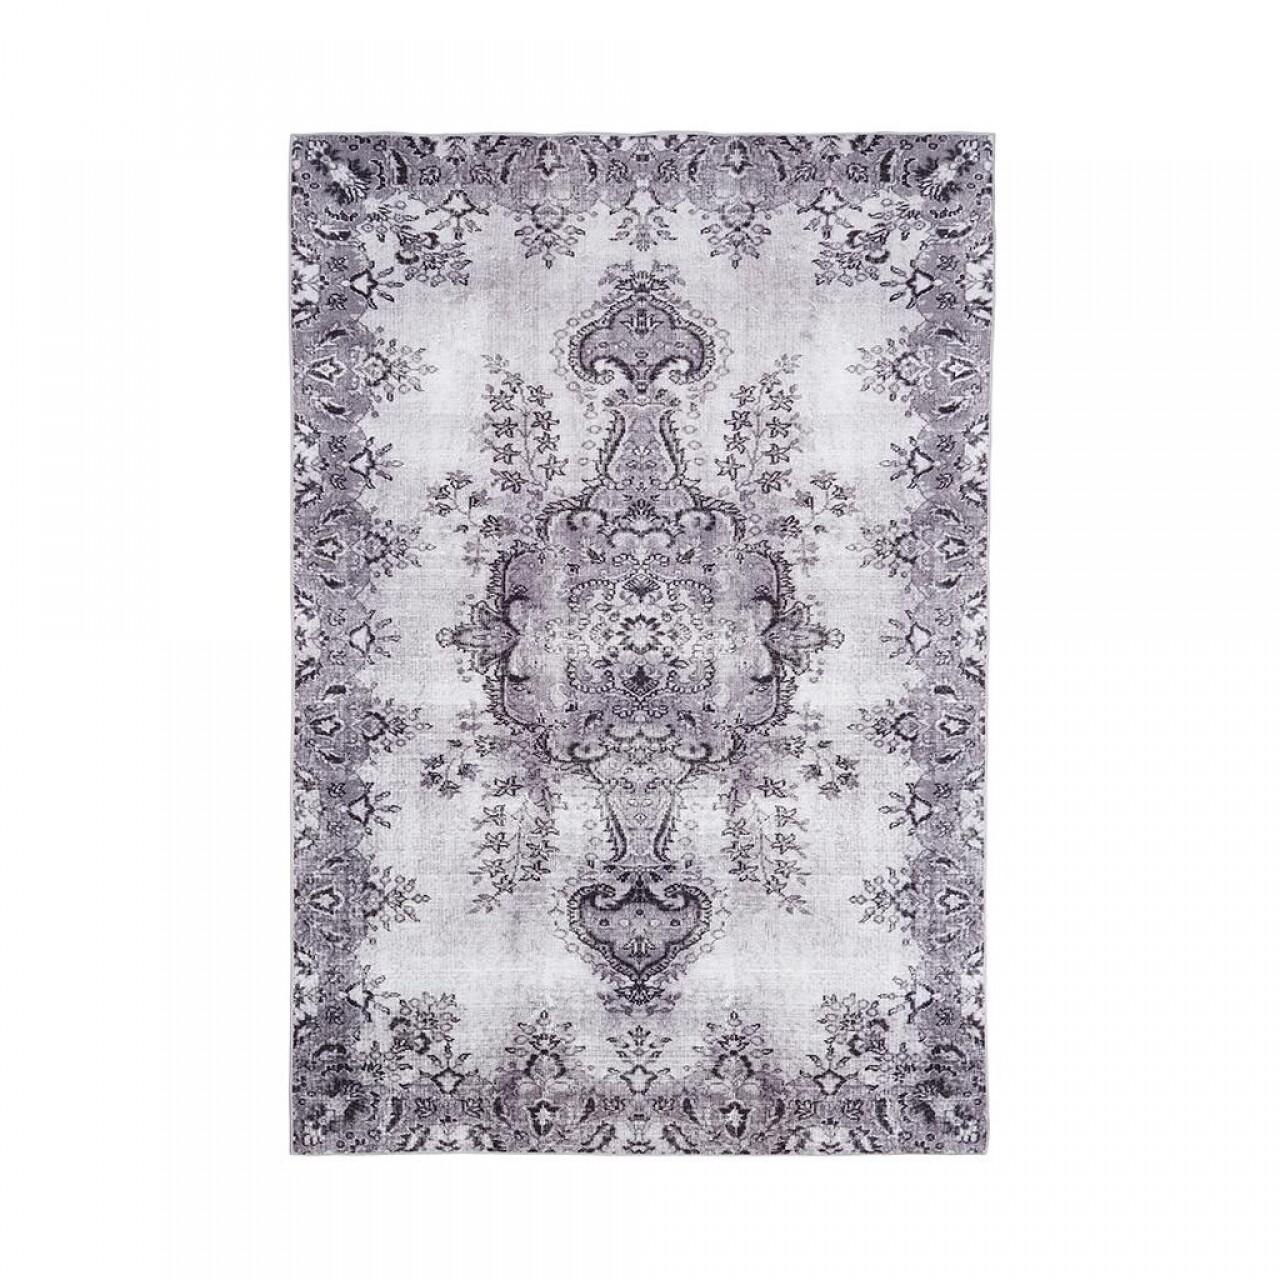 Covor Jasmine, Floorita, 160 x 230 cm, 70% poliester chenille, 30% bumbac chenille, gri